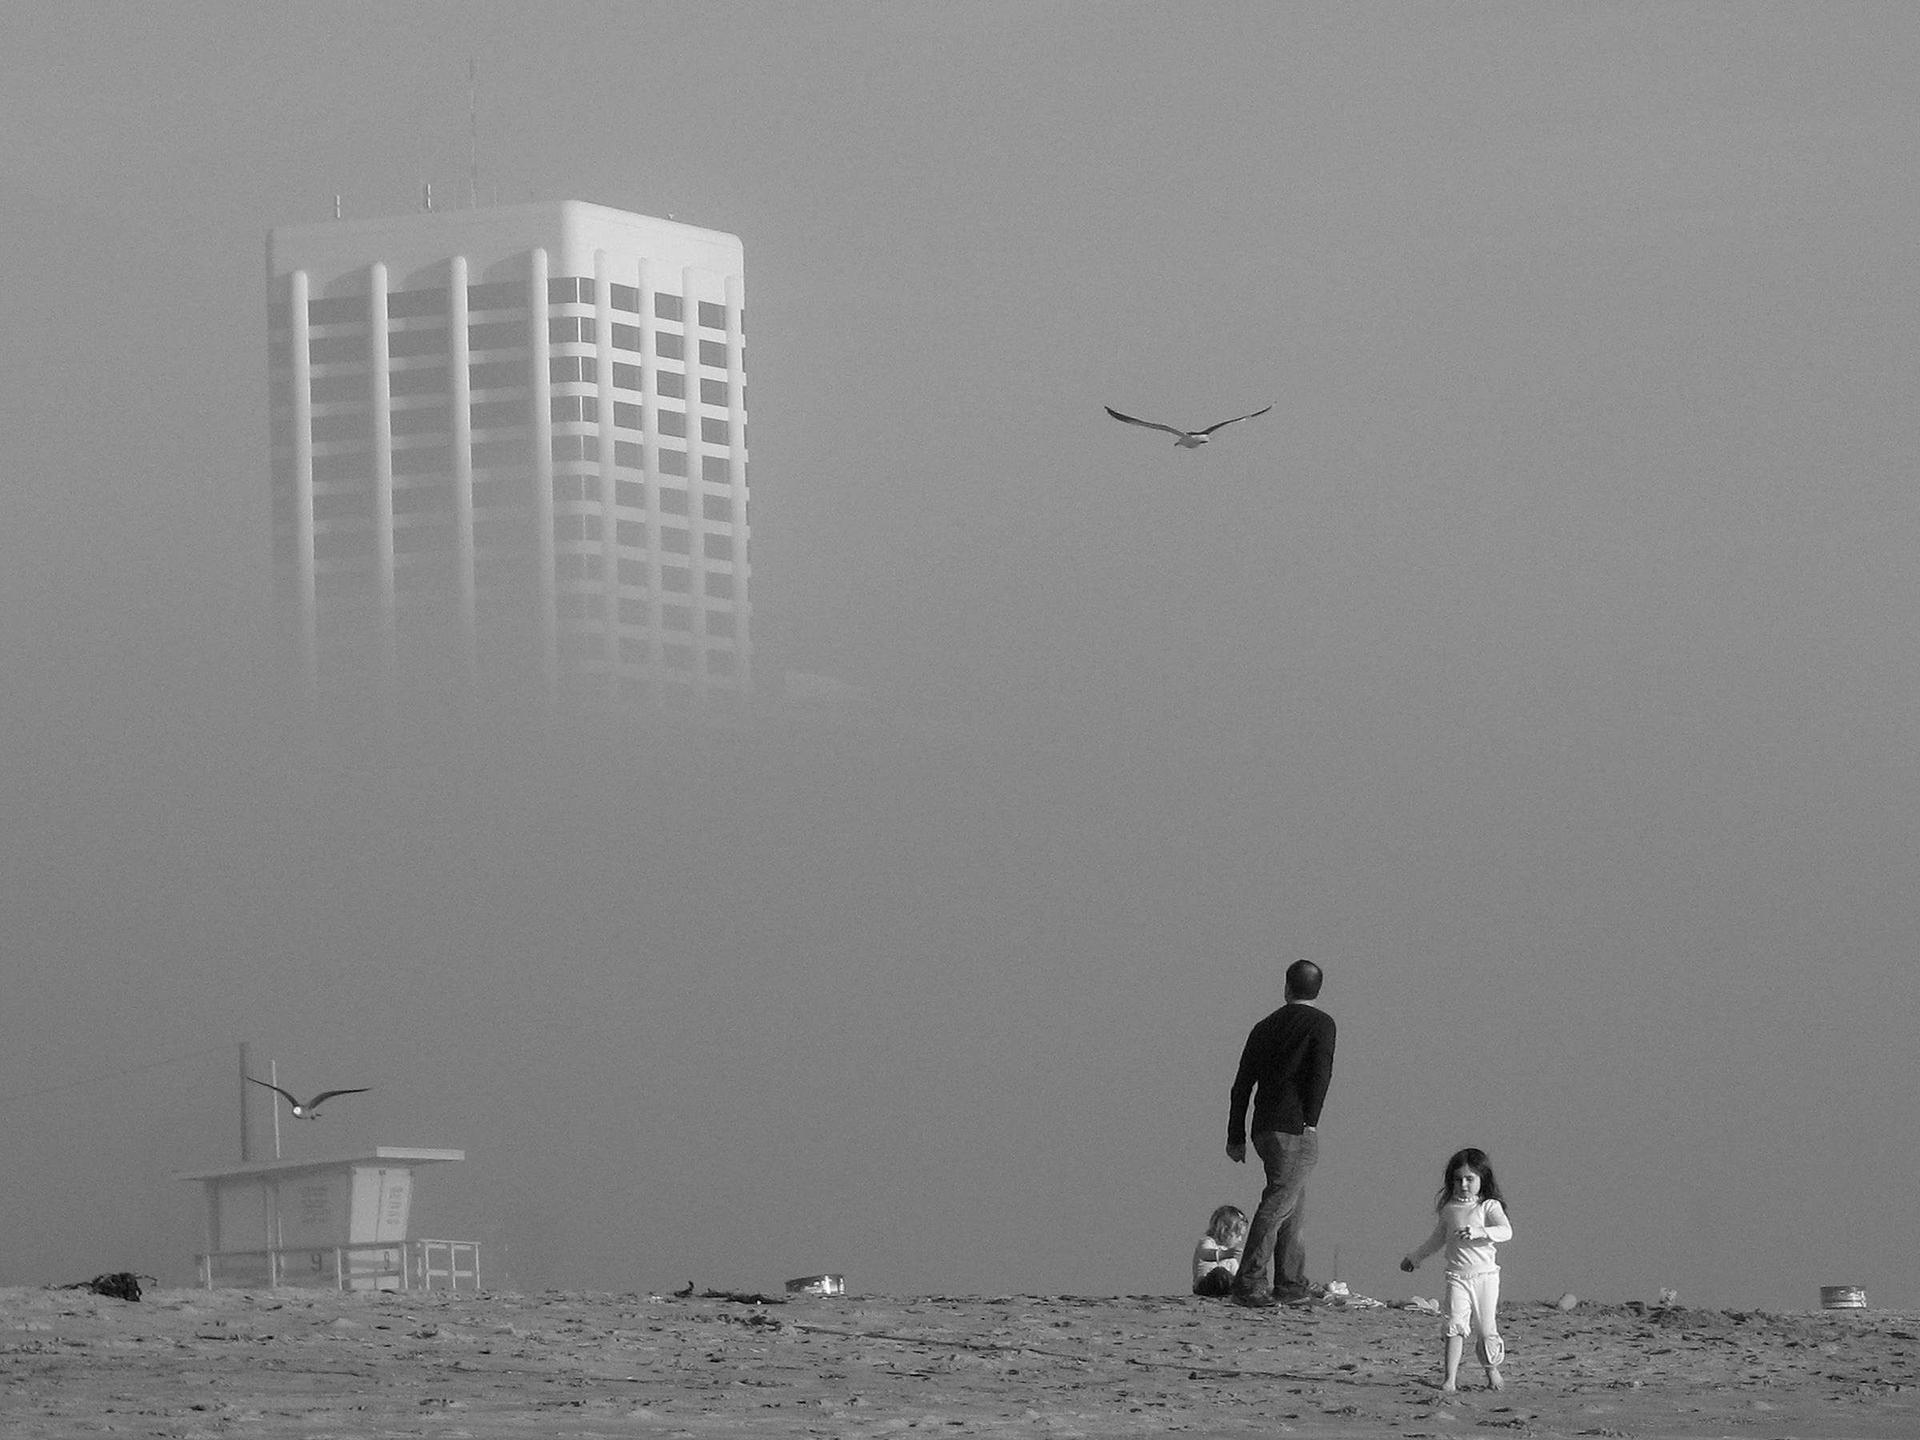 Photograph by Alireza Ajam